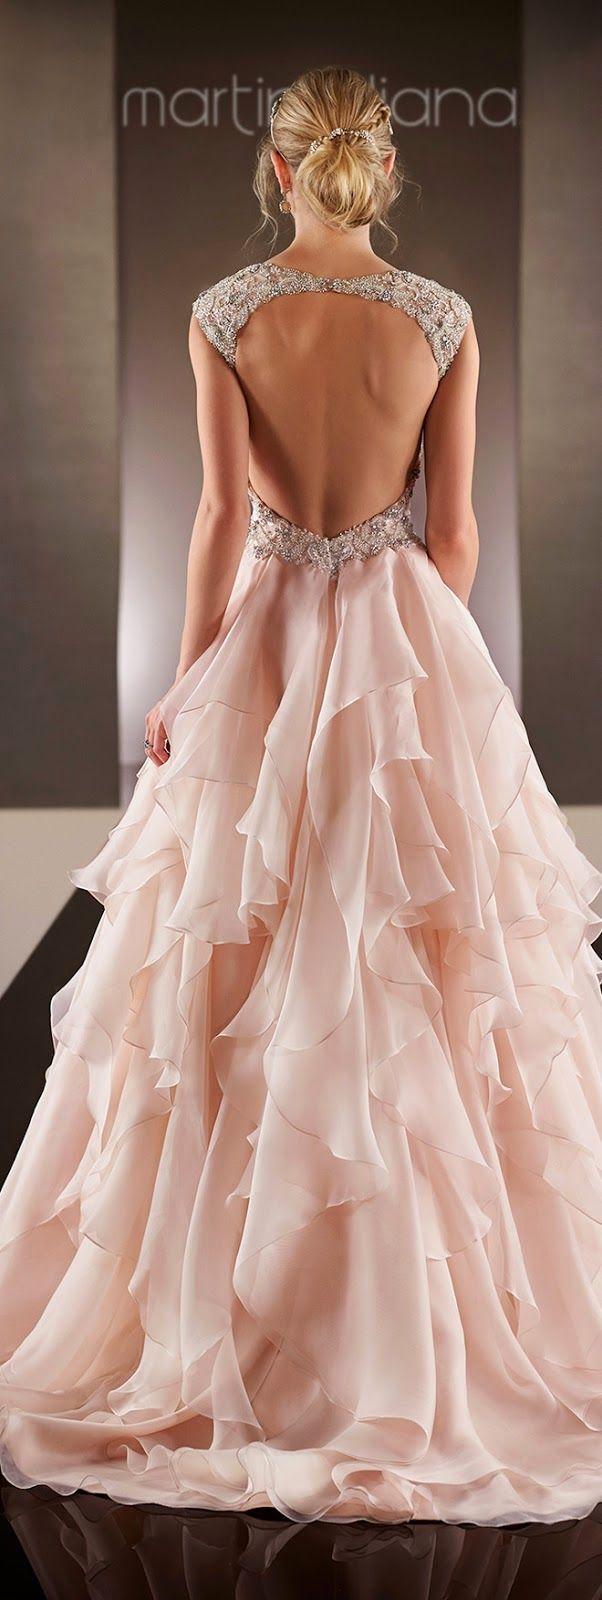 214 best Wedding Inspiration images on Pinterest | Receptions ...